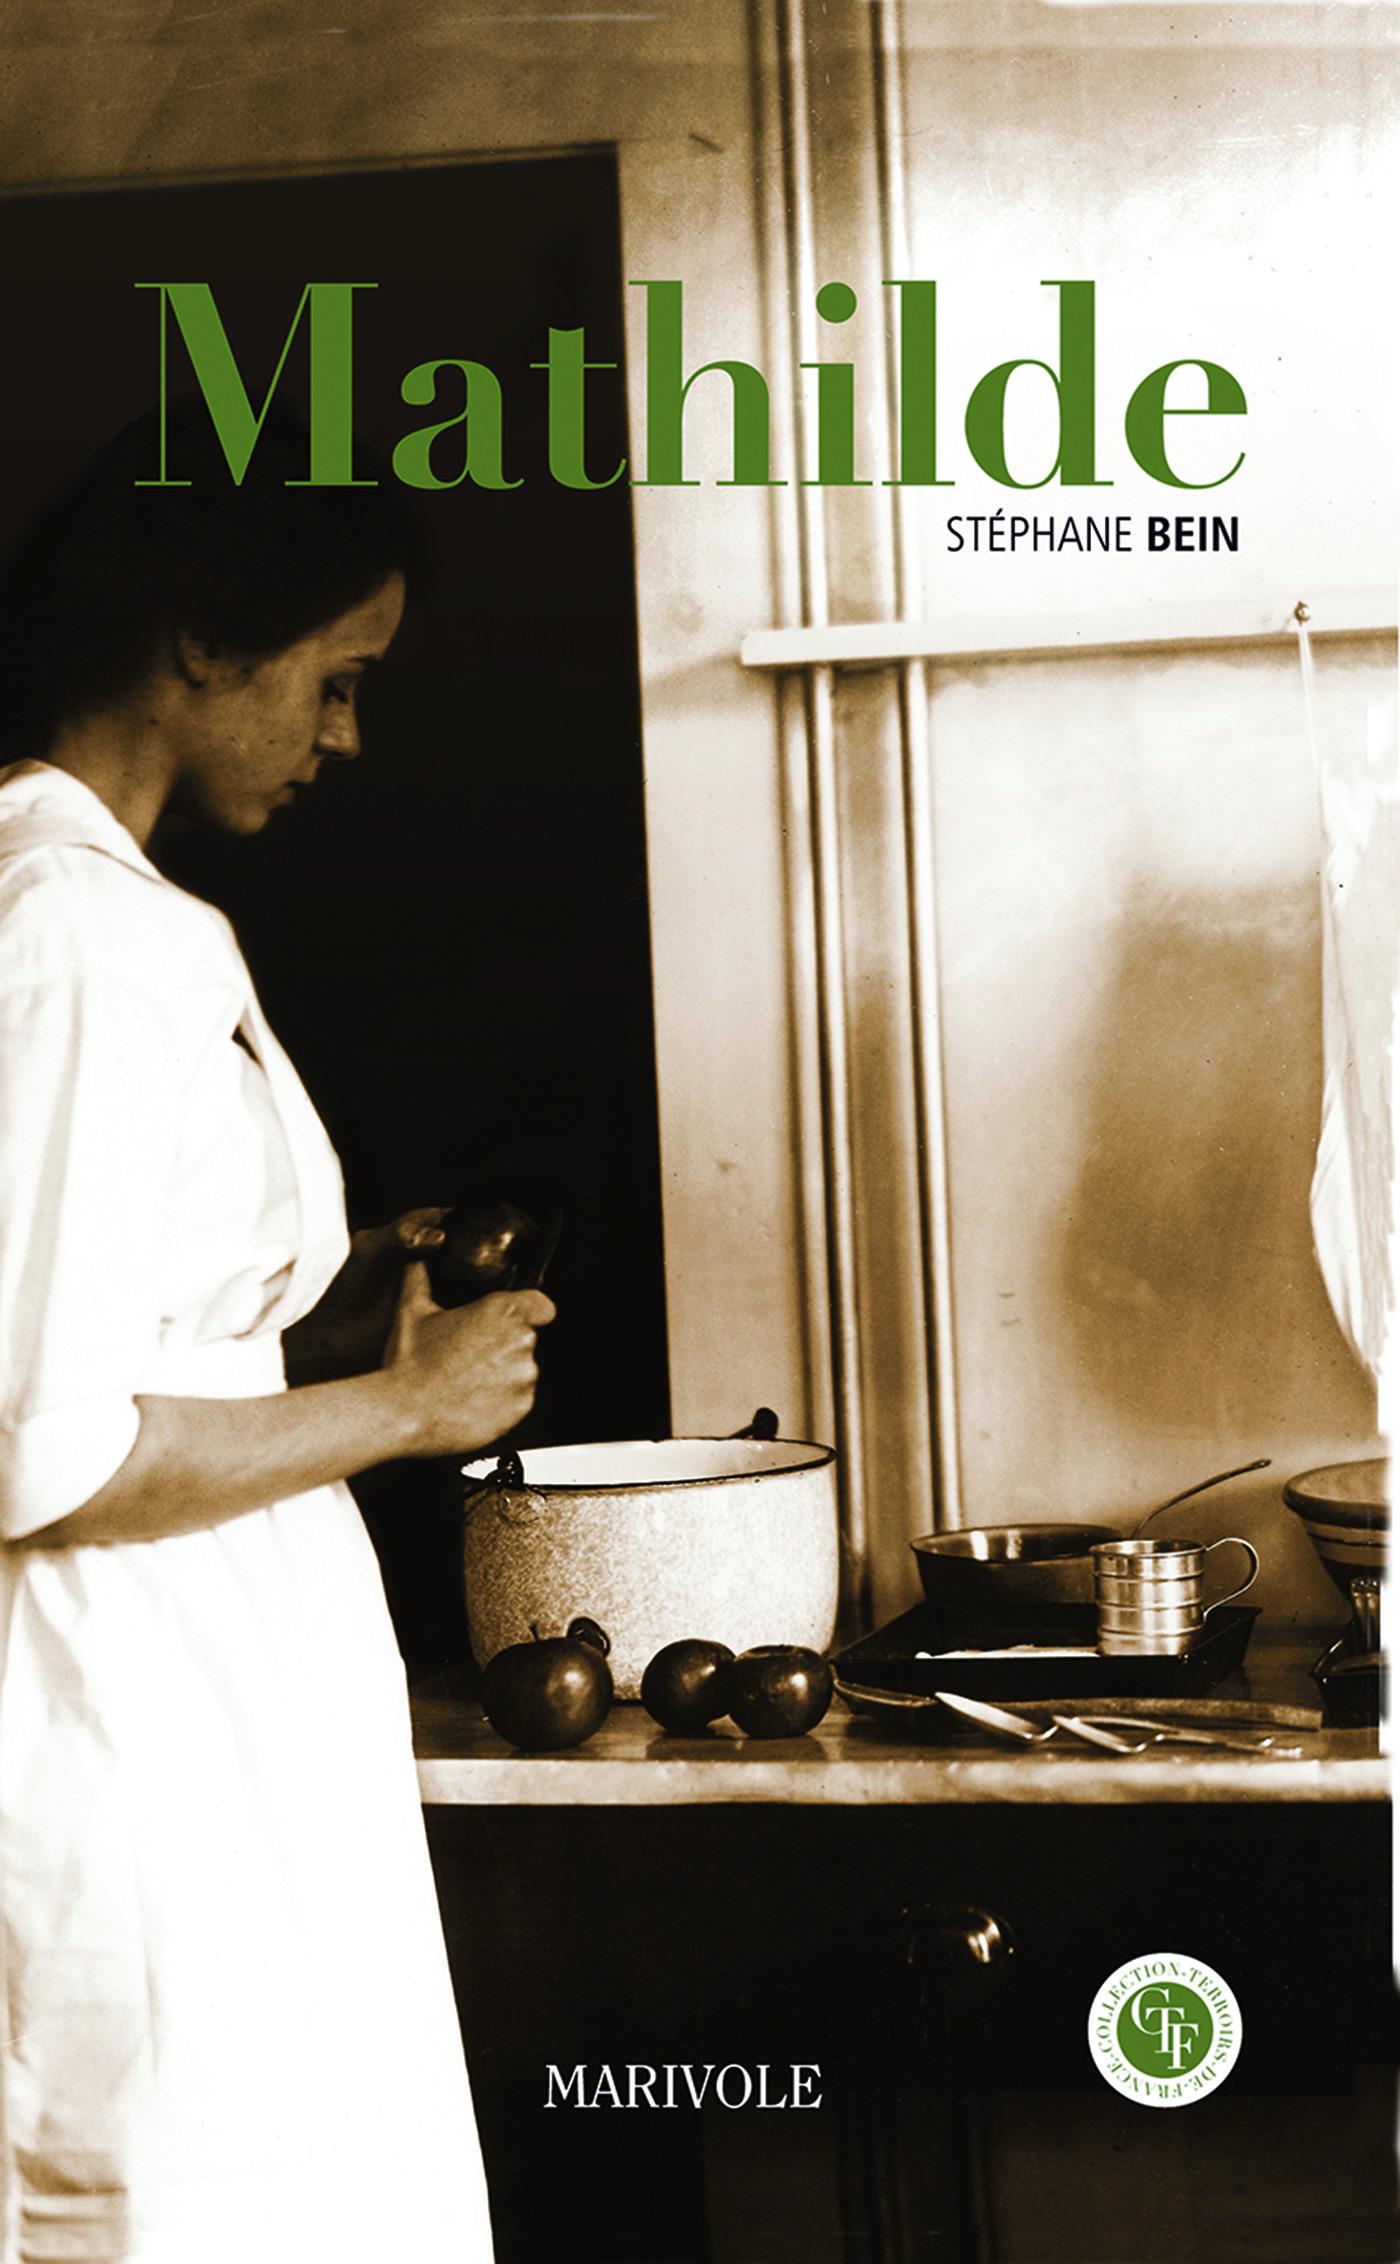 Mathilde  - Stephane Bein